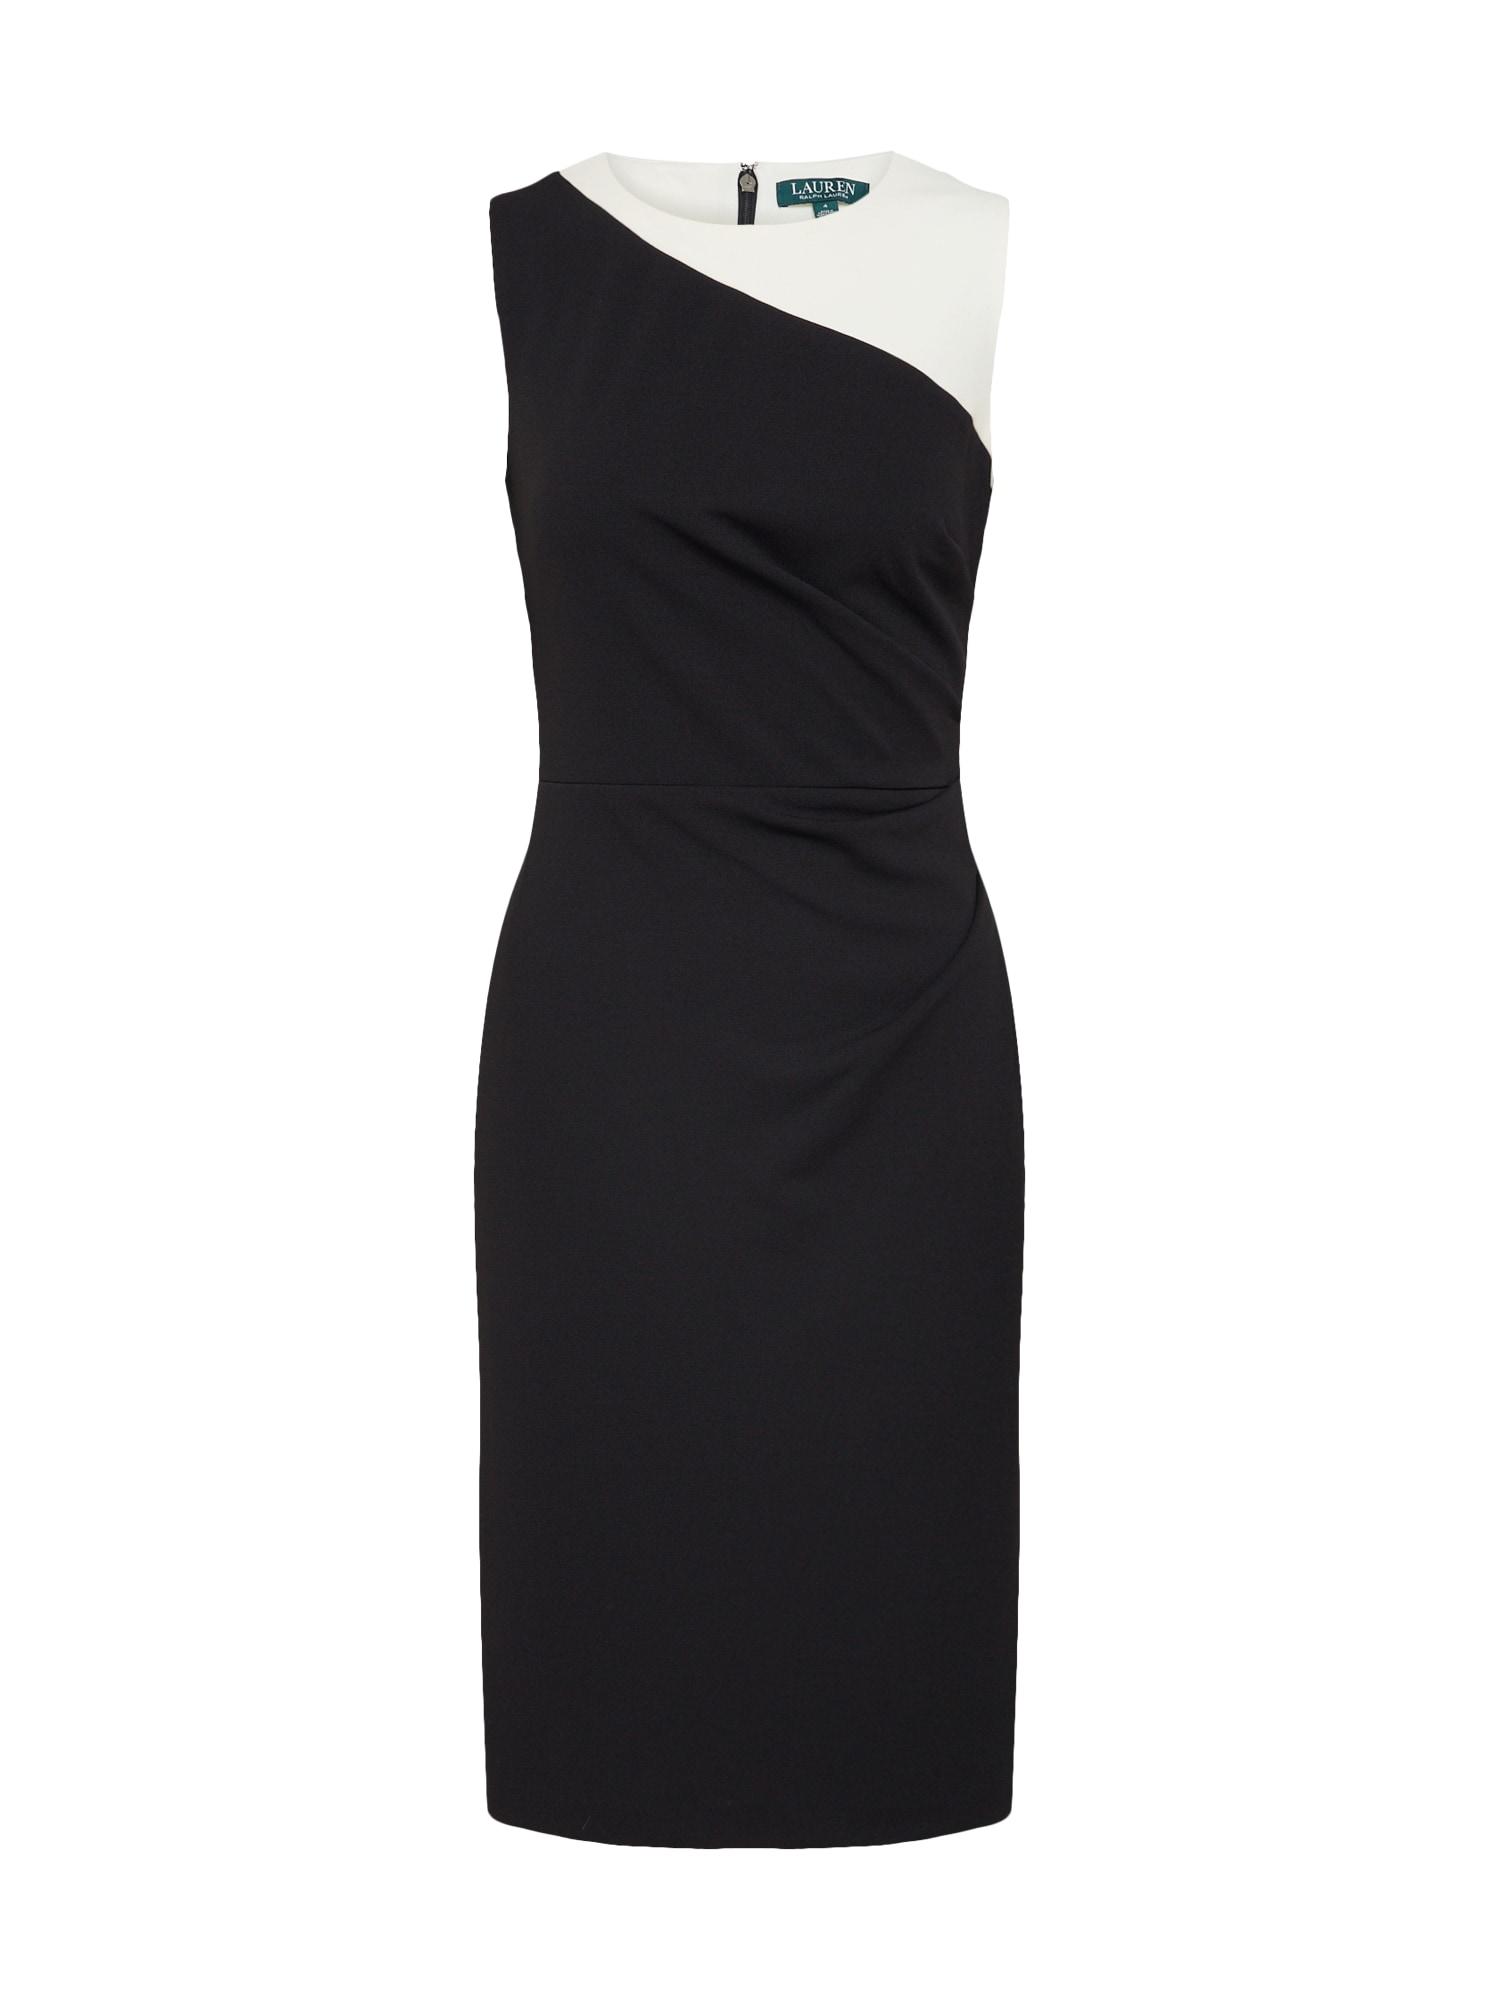 Pouzdrové šaty FINNLIE krémová černá Lauren Ralph Lauren